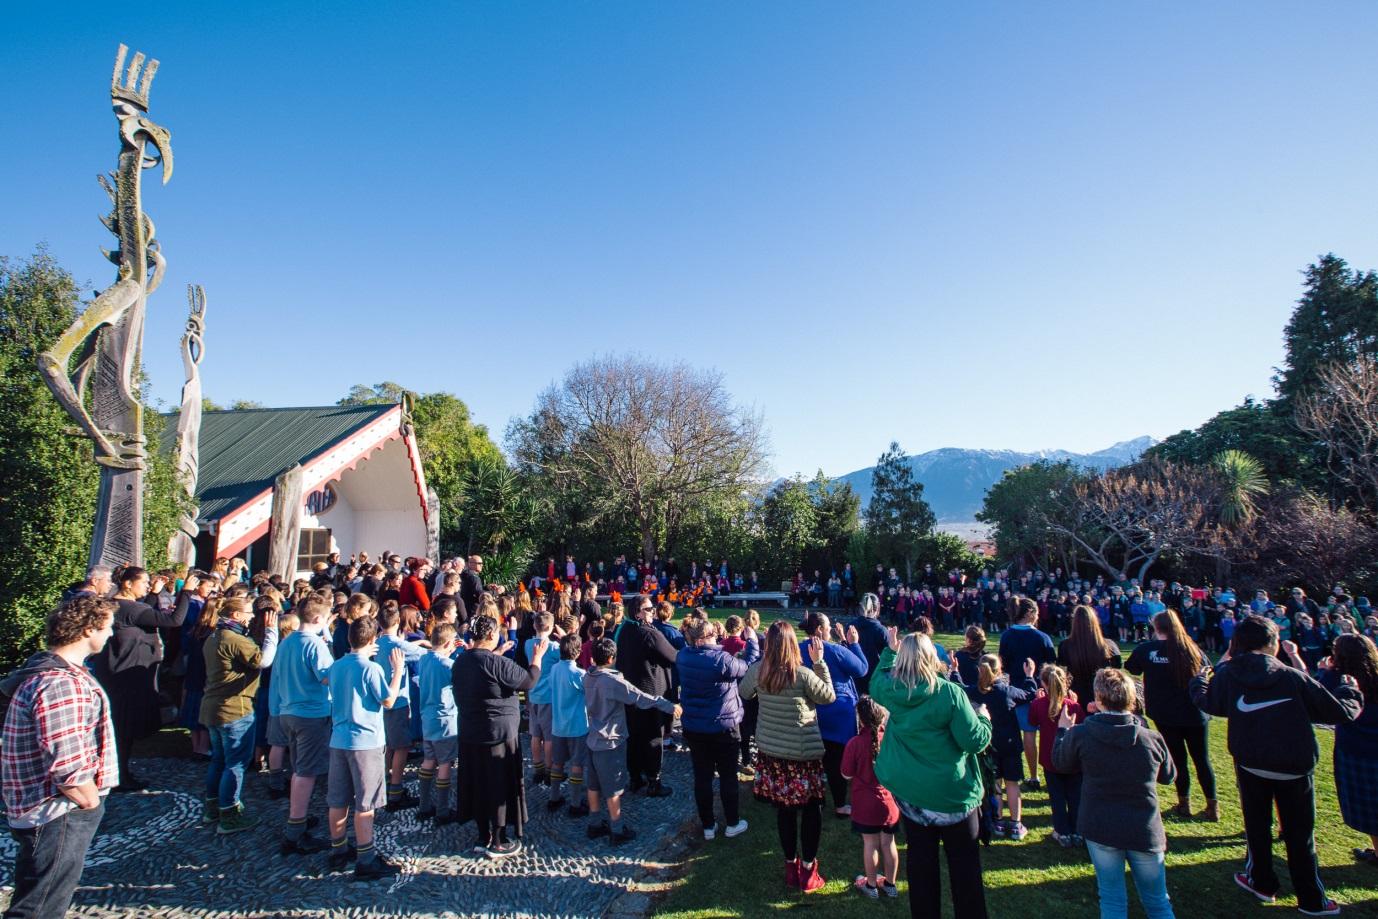 The matariki activities attracted a big crowd to Takahanga Marae. Photo courtesy of Andrew Spencer.